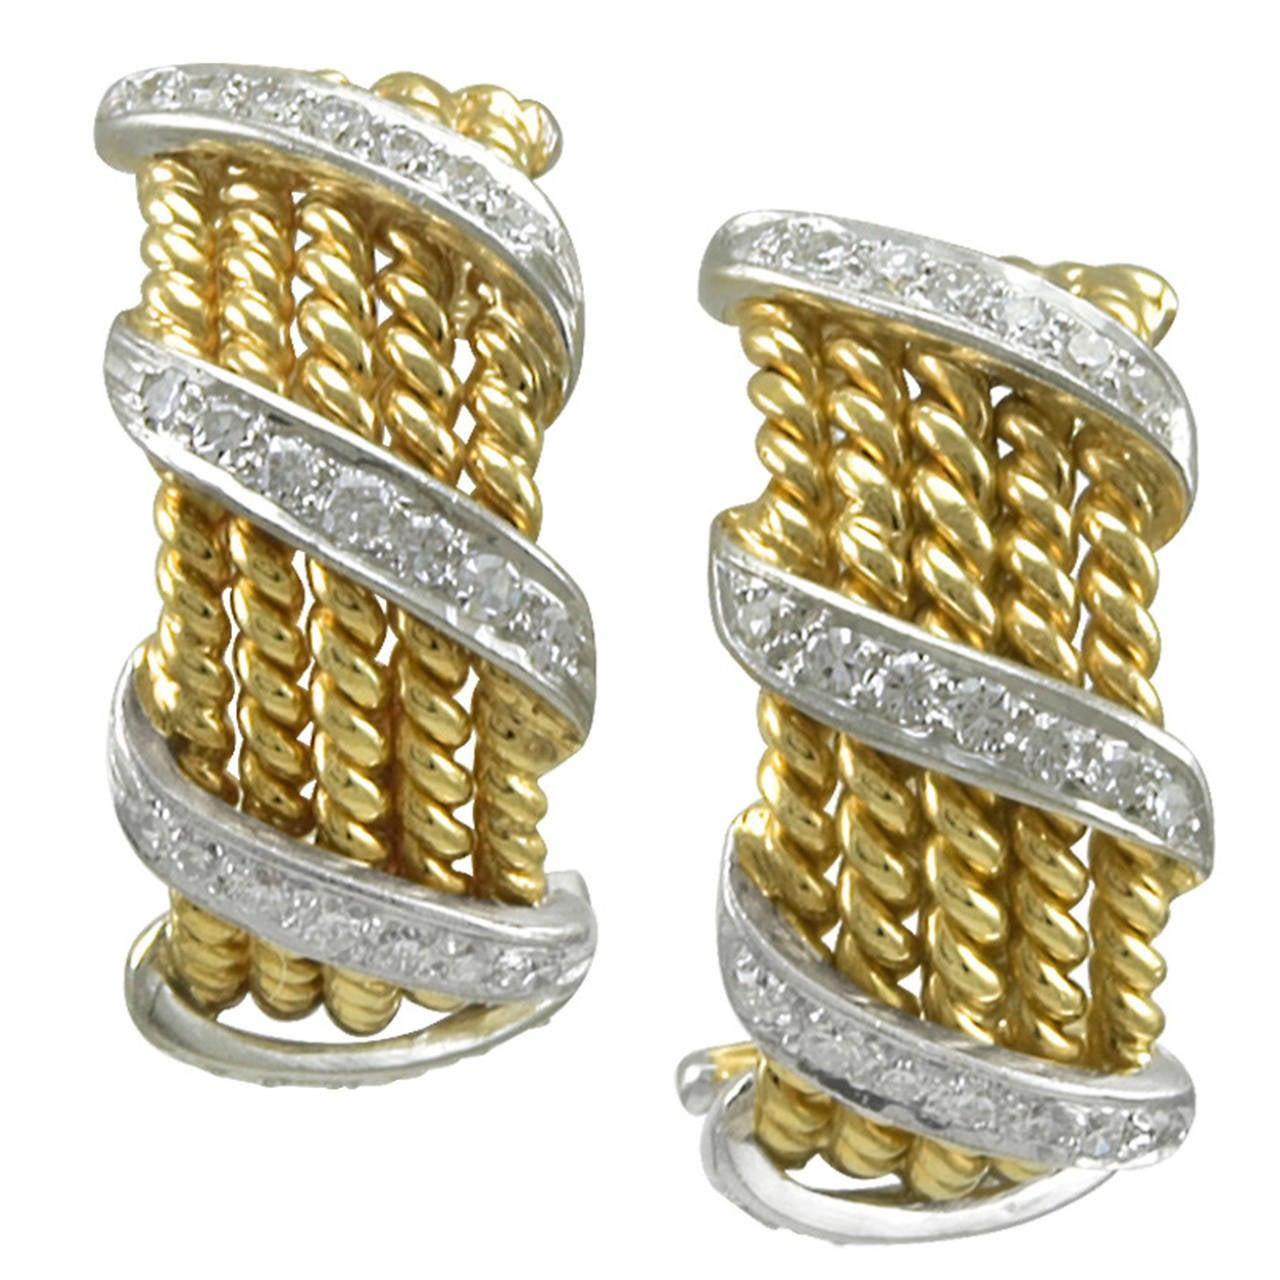 Tiffany & Co. Schlumberger Diamond Gold Band Earrings